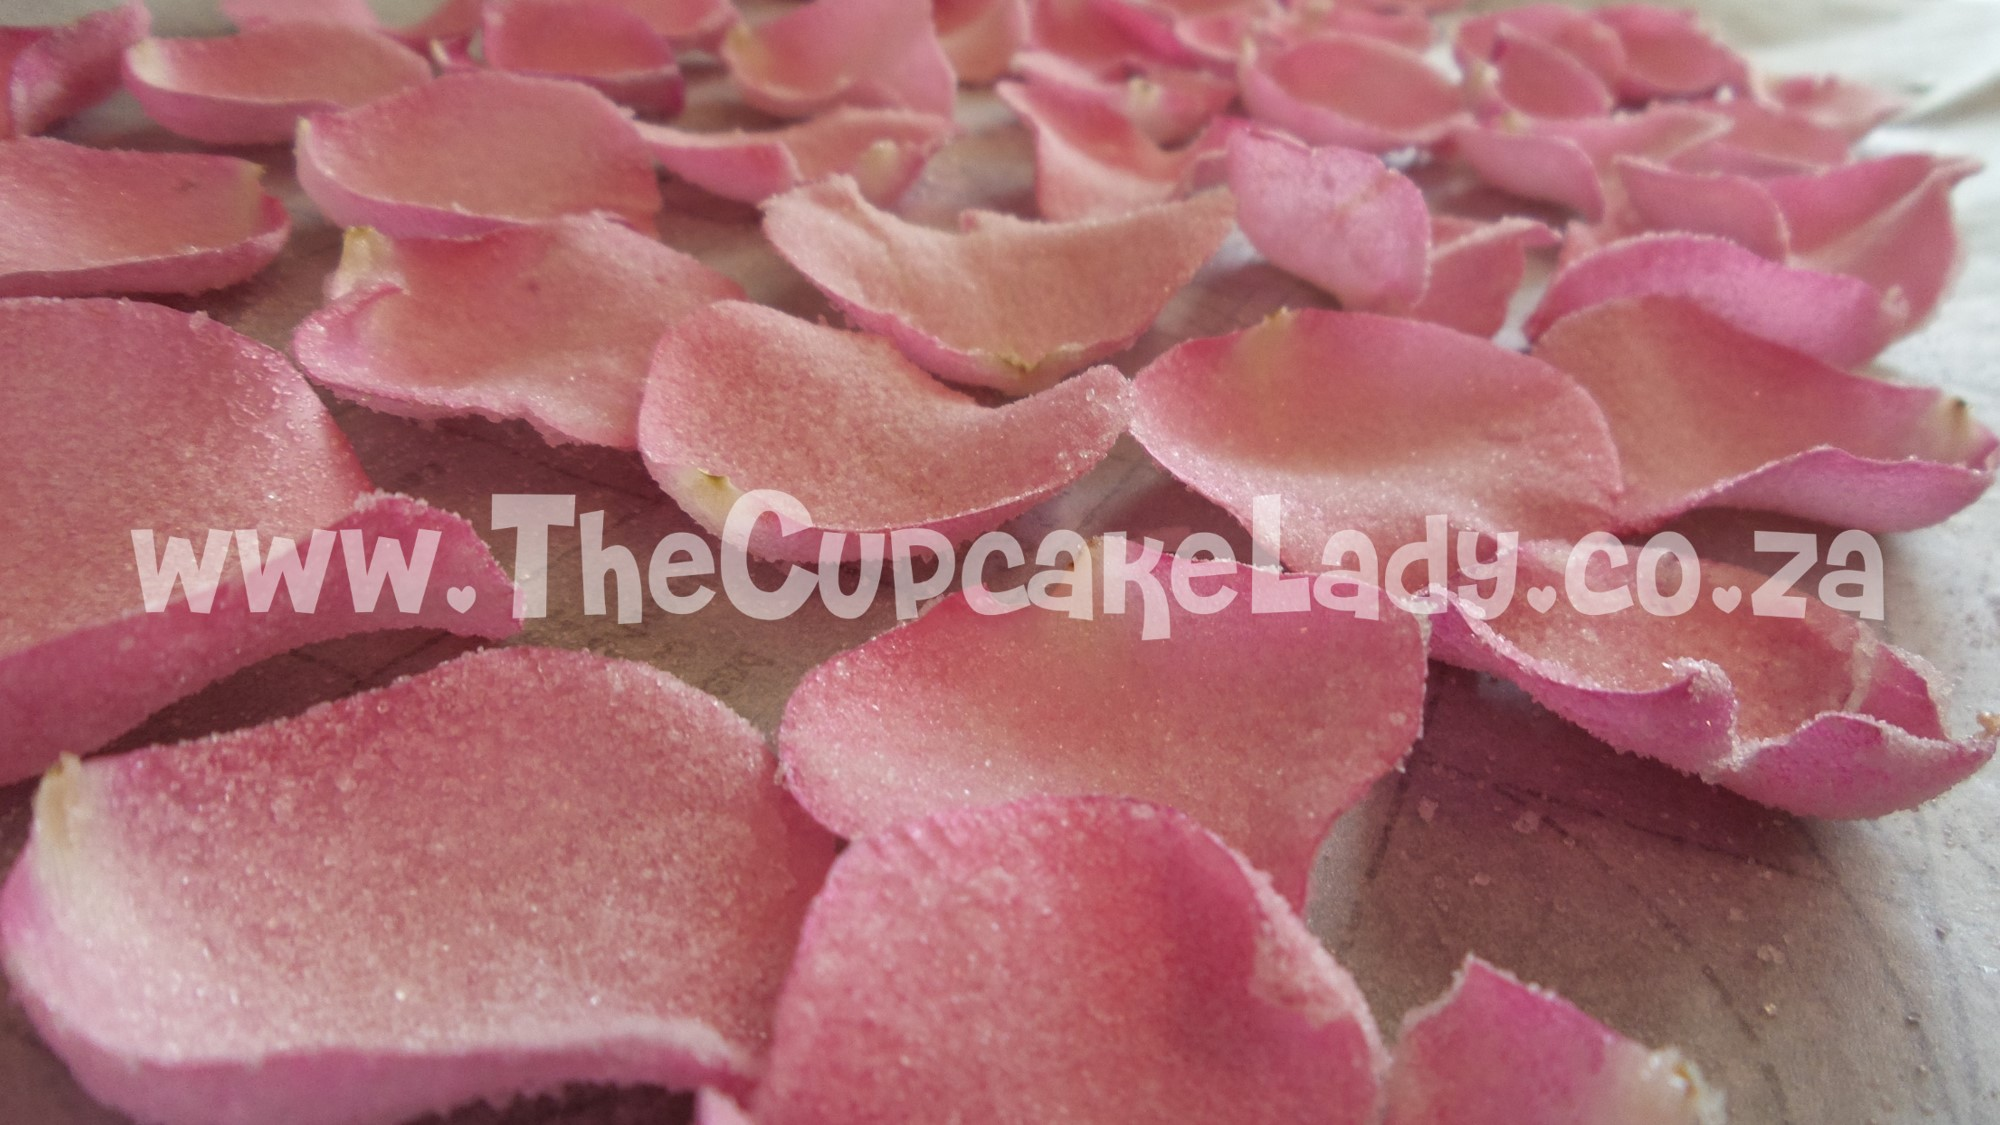 two tiered cake, chocolate and vanilla, pink velvet cupcakes, cream cheese icing, crystallised rose petal, sugar paste dog